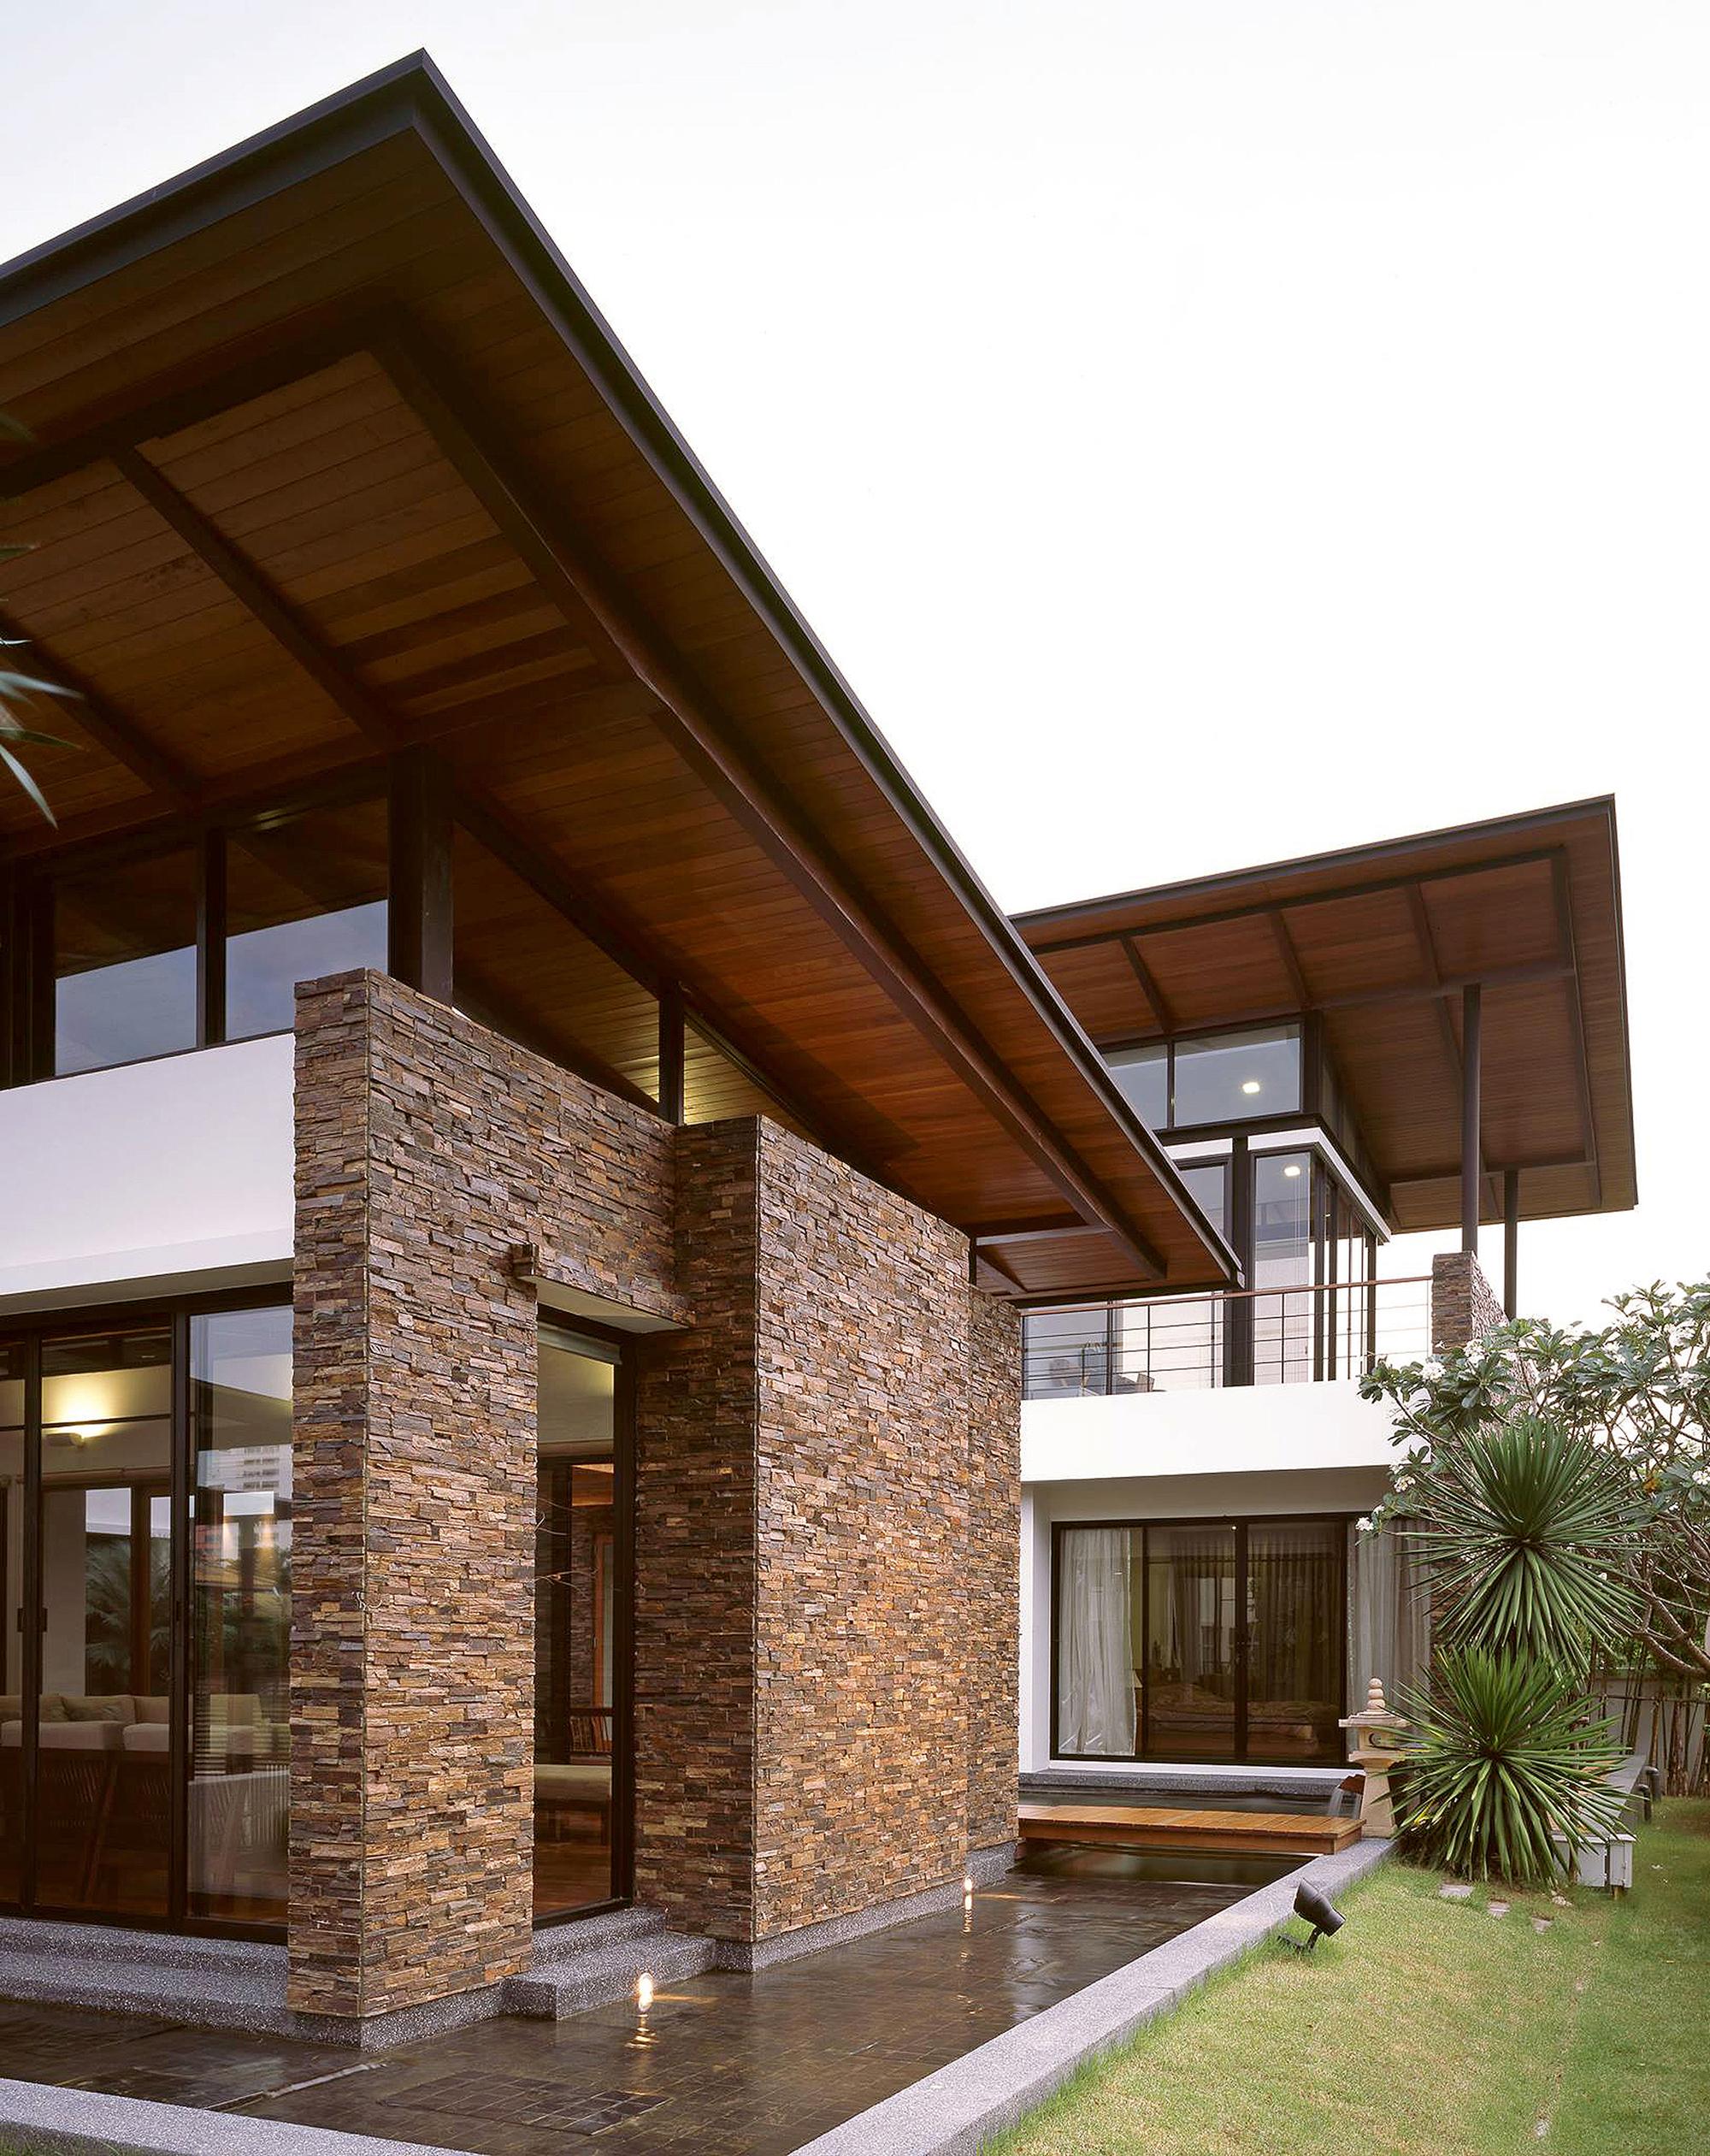 Gallery Of Nature House / Junsekino Architect And Design